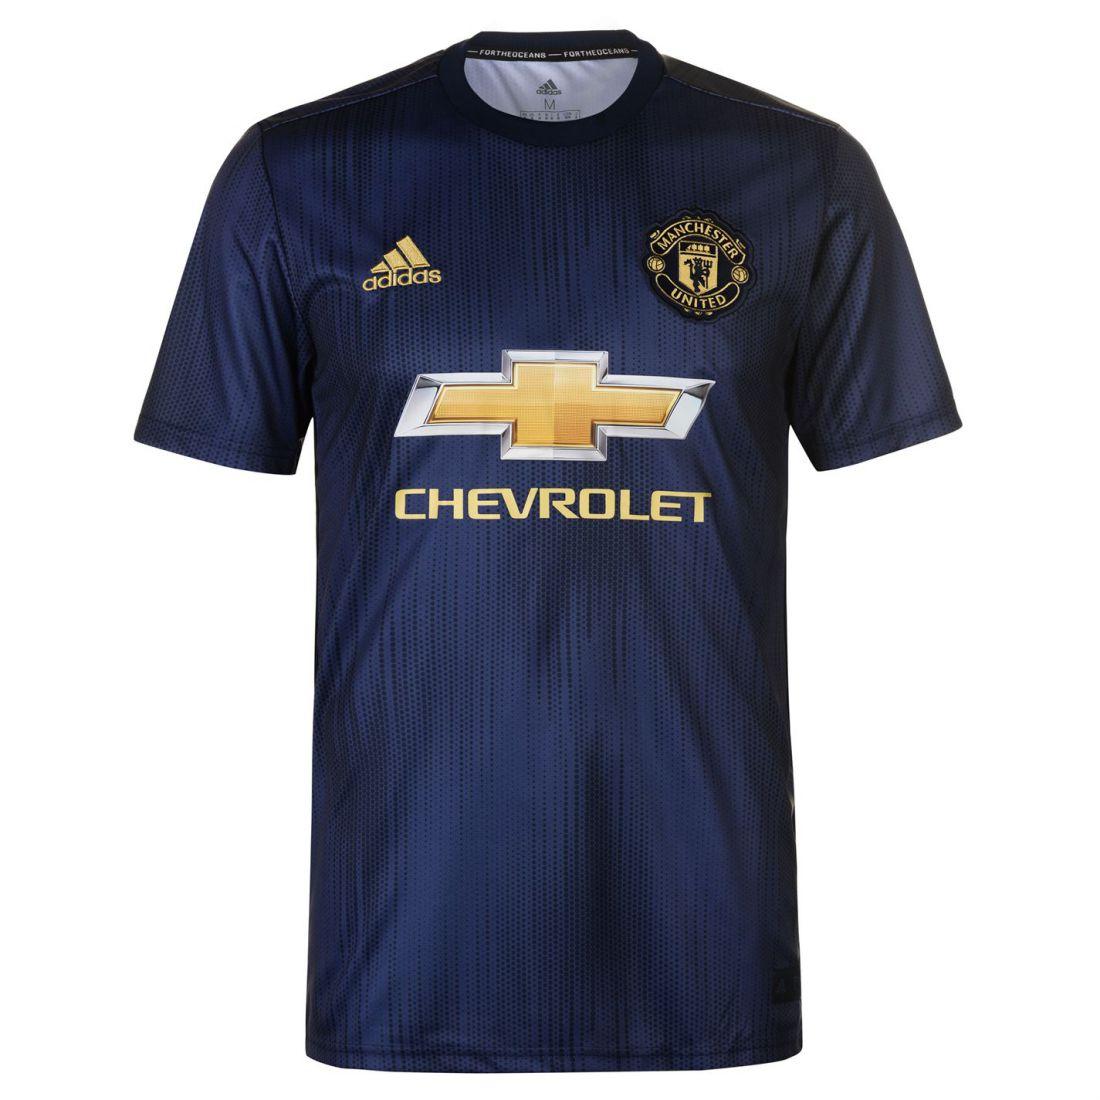 abf70efa521 adidas Mens Manchester United Third Shirt 2018 2019 Domestic ...